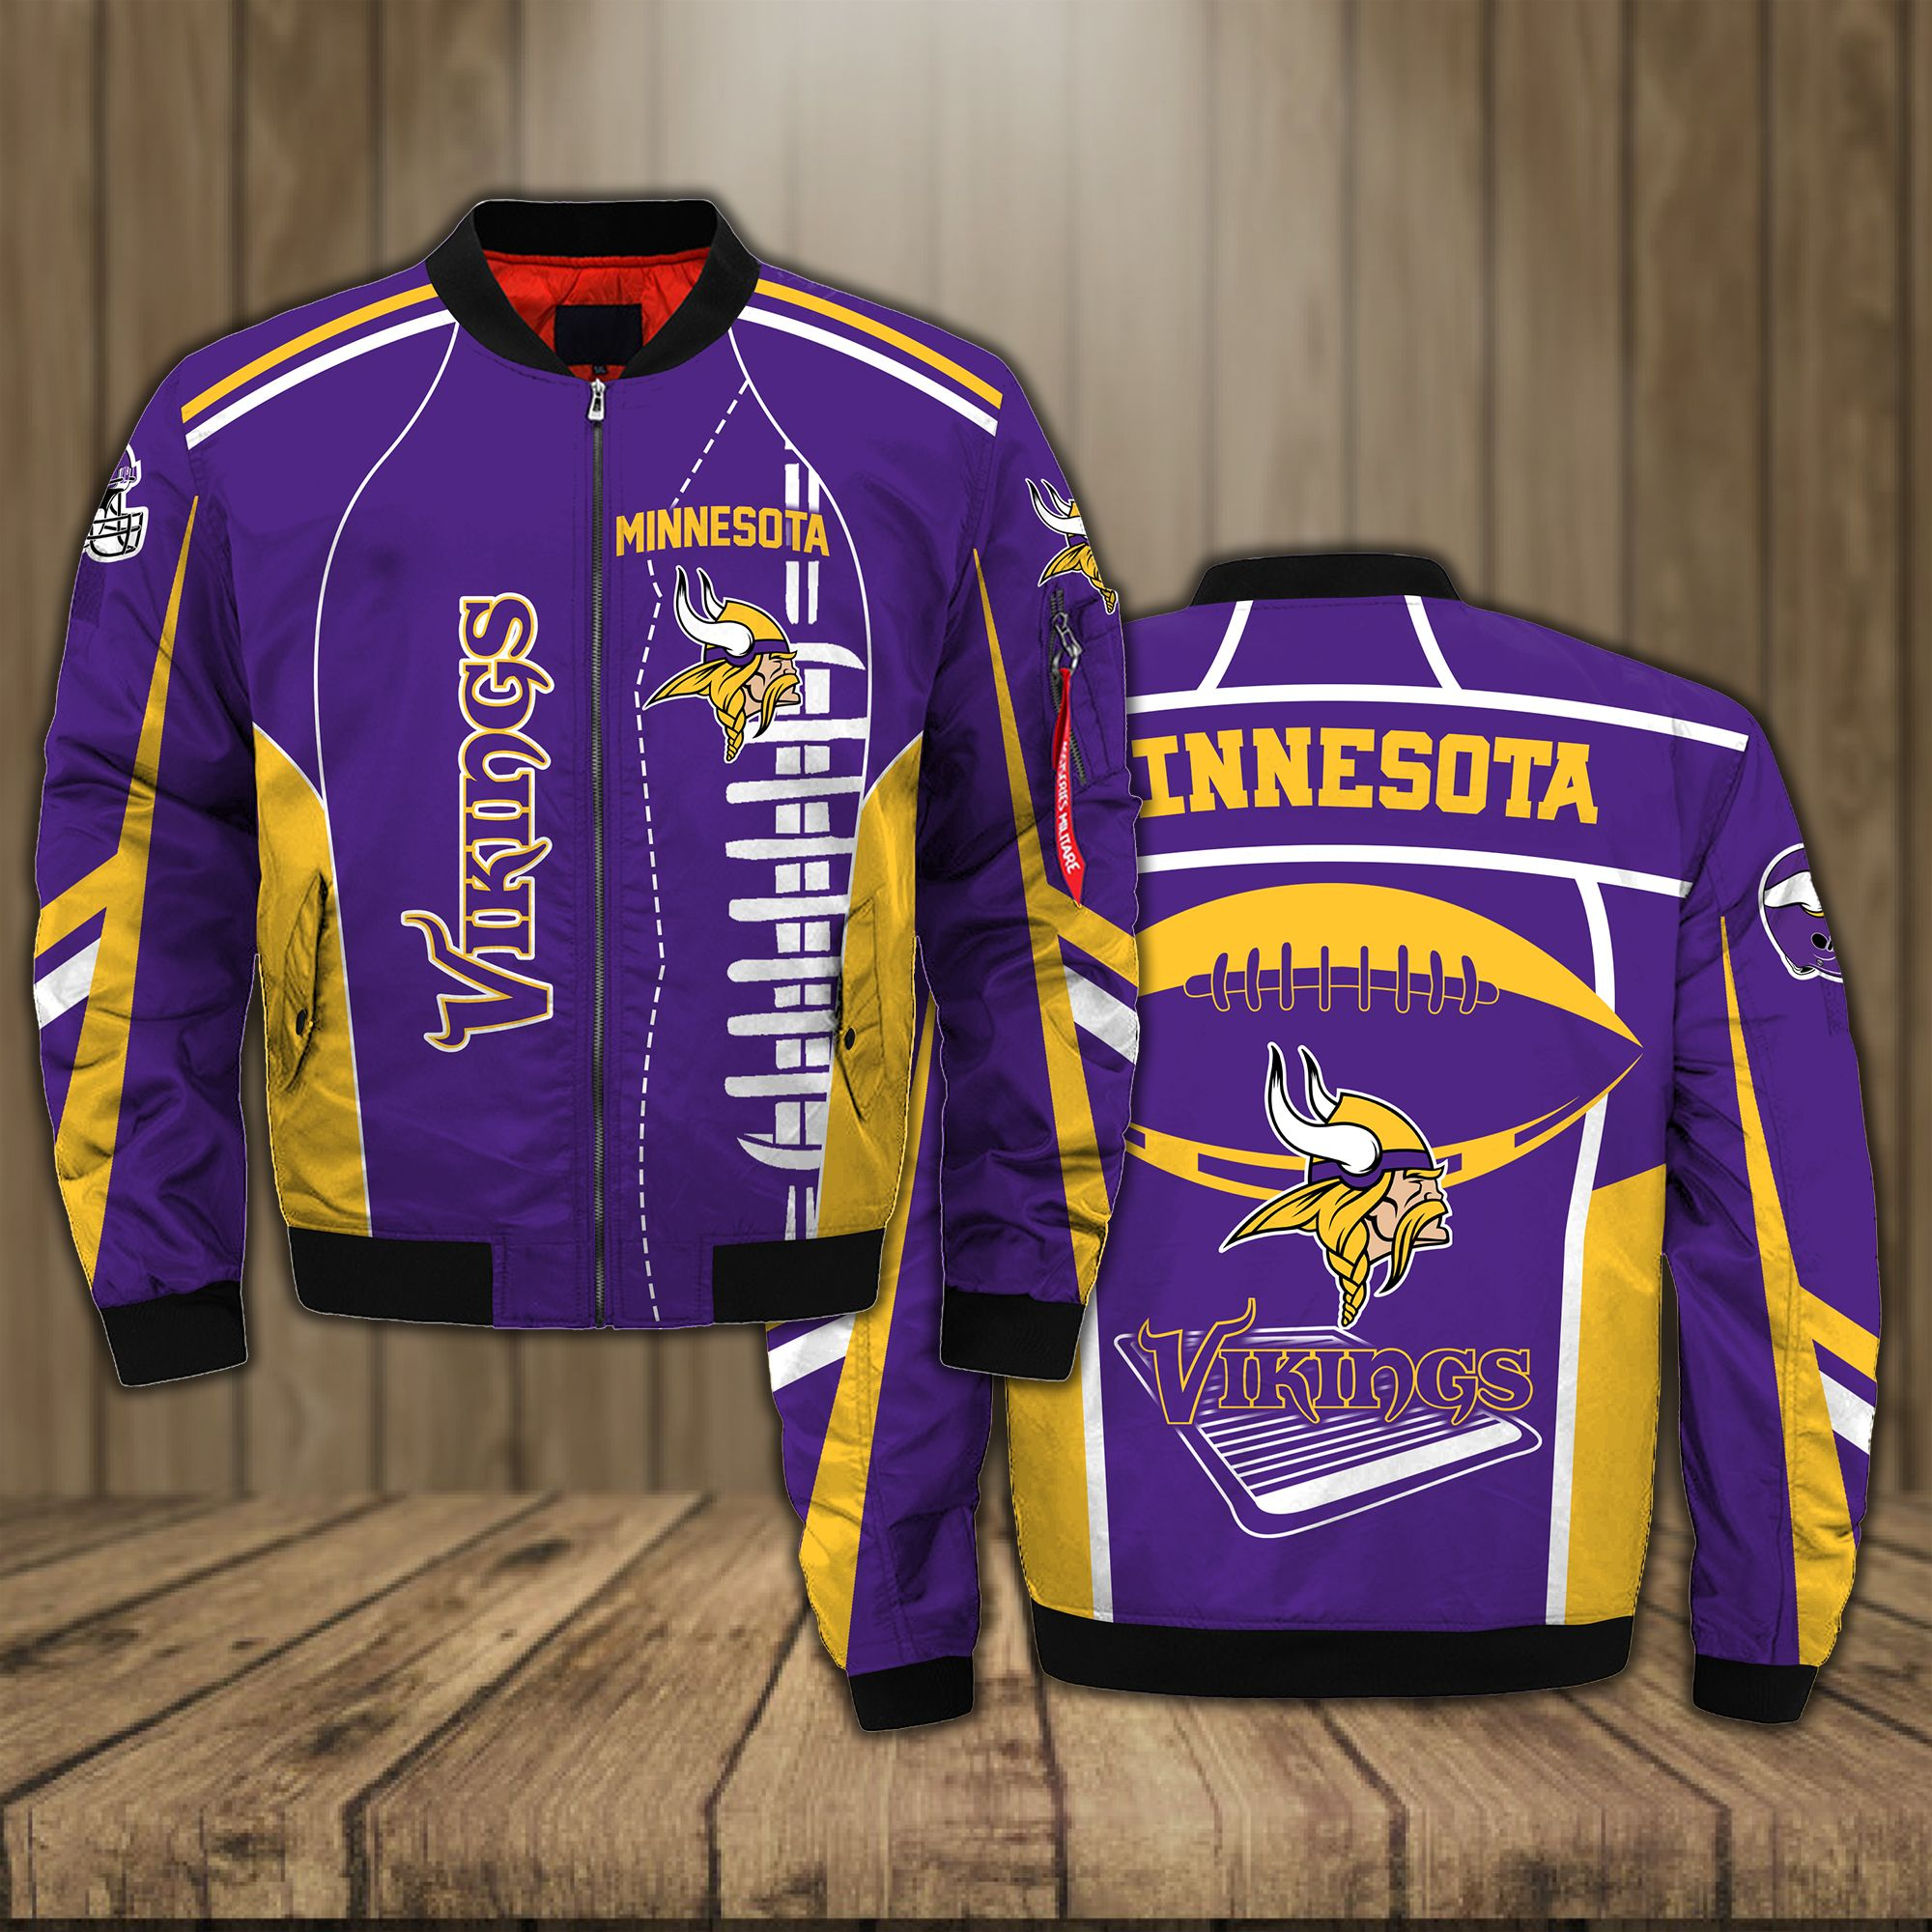 Custom Minnesota Vikings Jacket Cheap You 039 Ll Be Feeling As Spirited As Ever When In This Minnesota Vikings Jacket F Minnesota Vikings Cheap Jacket Vikings [ 2000 x 2000 Pixel ]